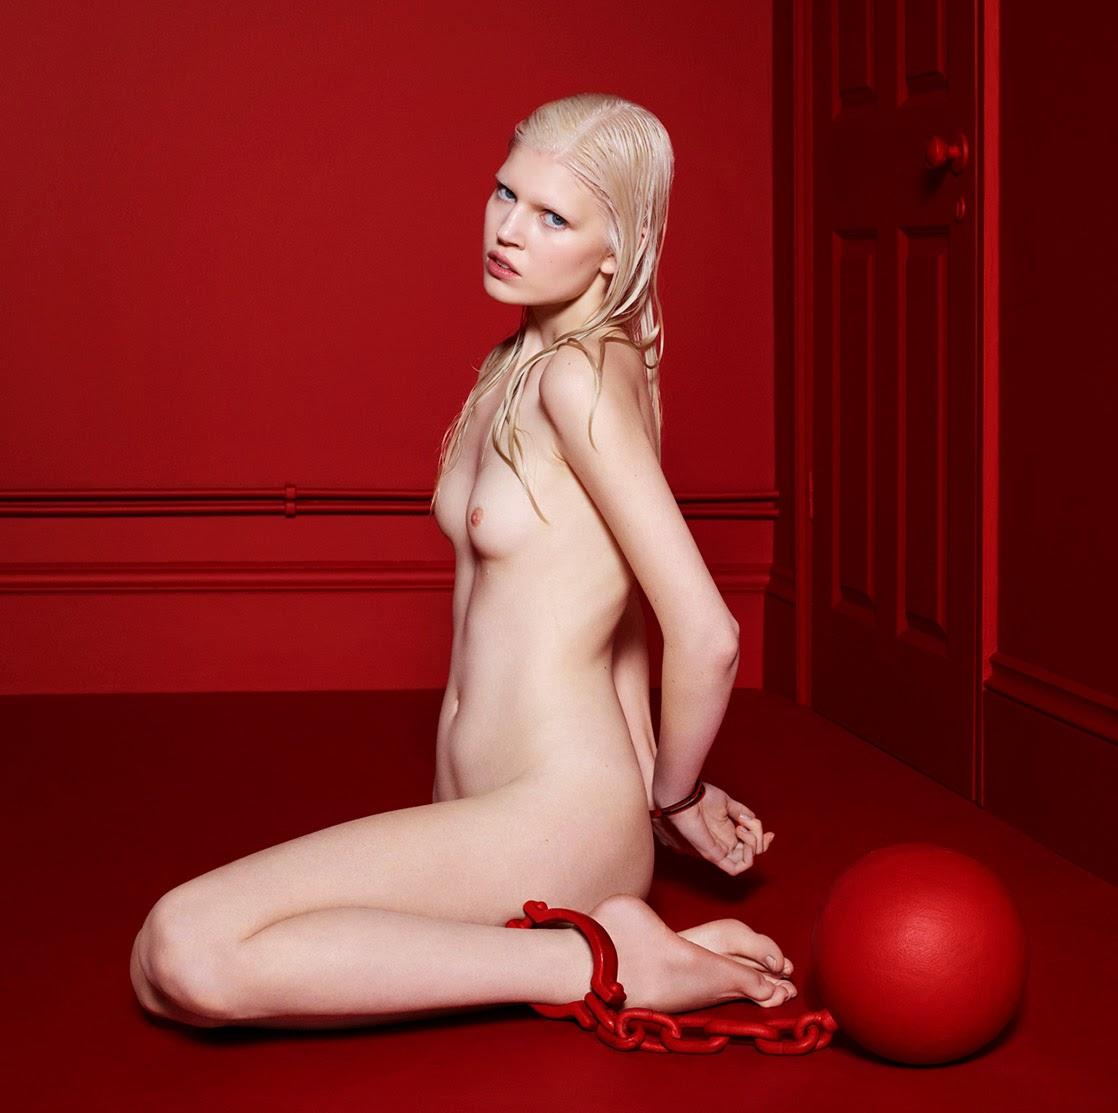 http://1.bp.blogspot.com/-T6ad4QO_VRE/Uy1CxJMsMjI/AAAAAAAA1oM/6m3cUZ8aytU/s1600/%25C2%25A9Cuneyt+Akeroglu+-+The+Red+Room+Project-009.jpg